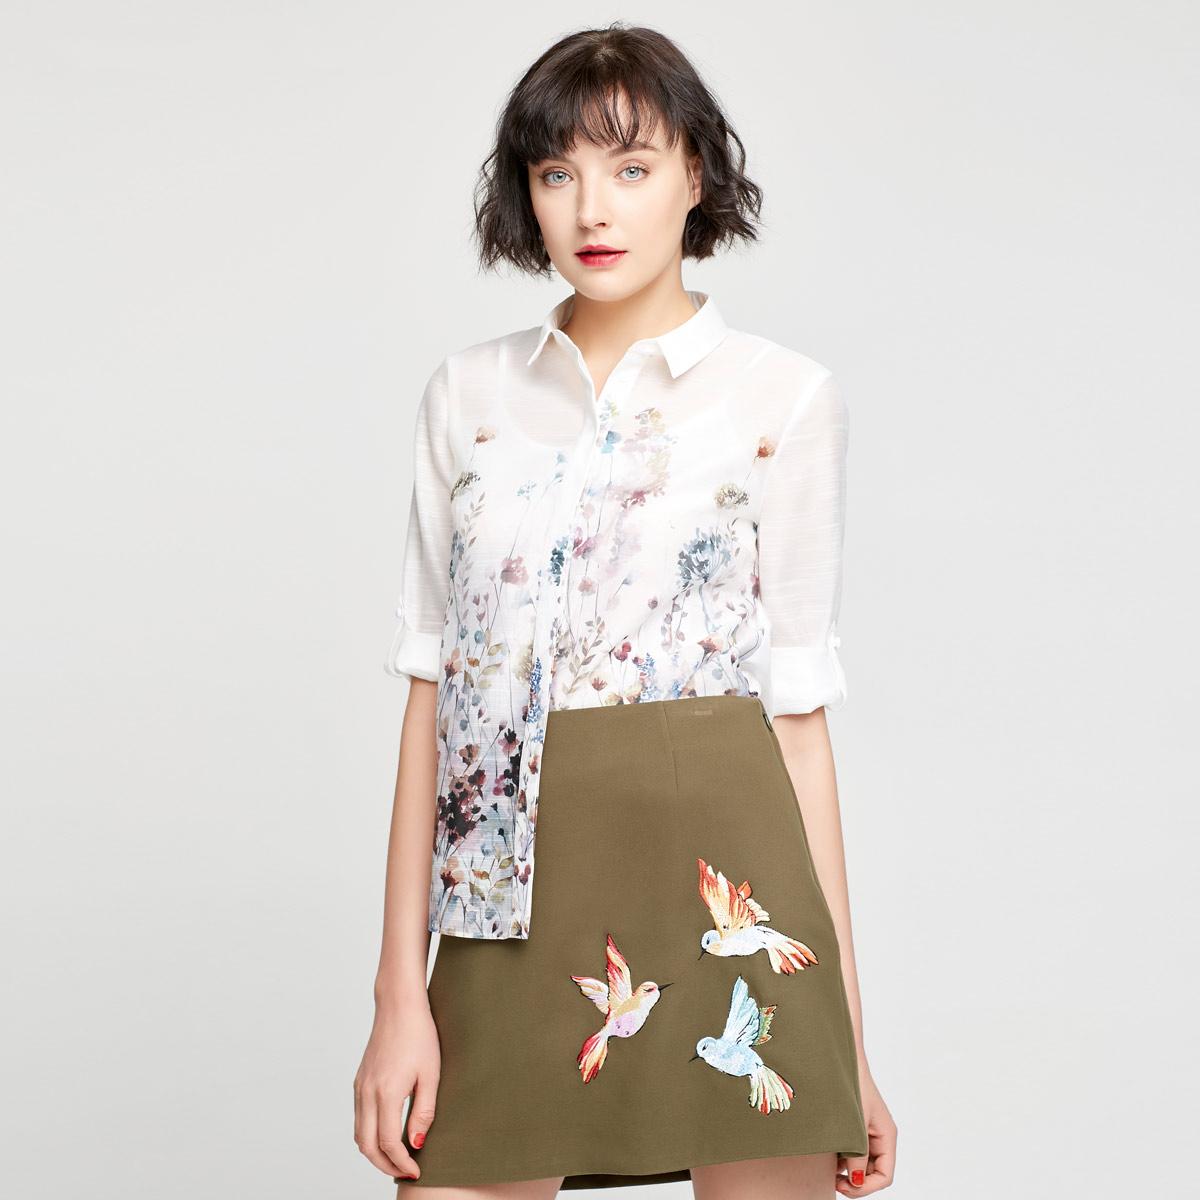 Vero Moda夏装新款两穿七分袖两件套印花衬衫女|317231550